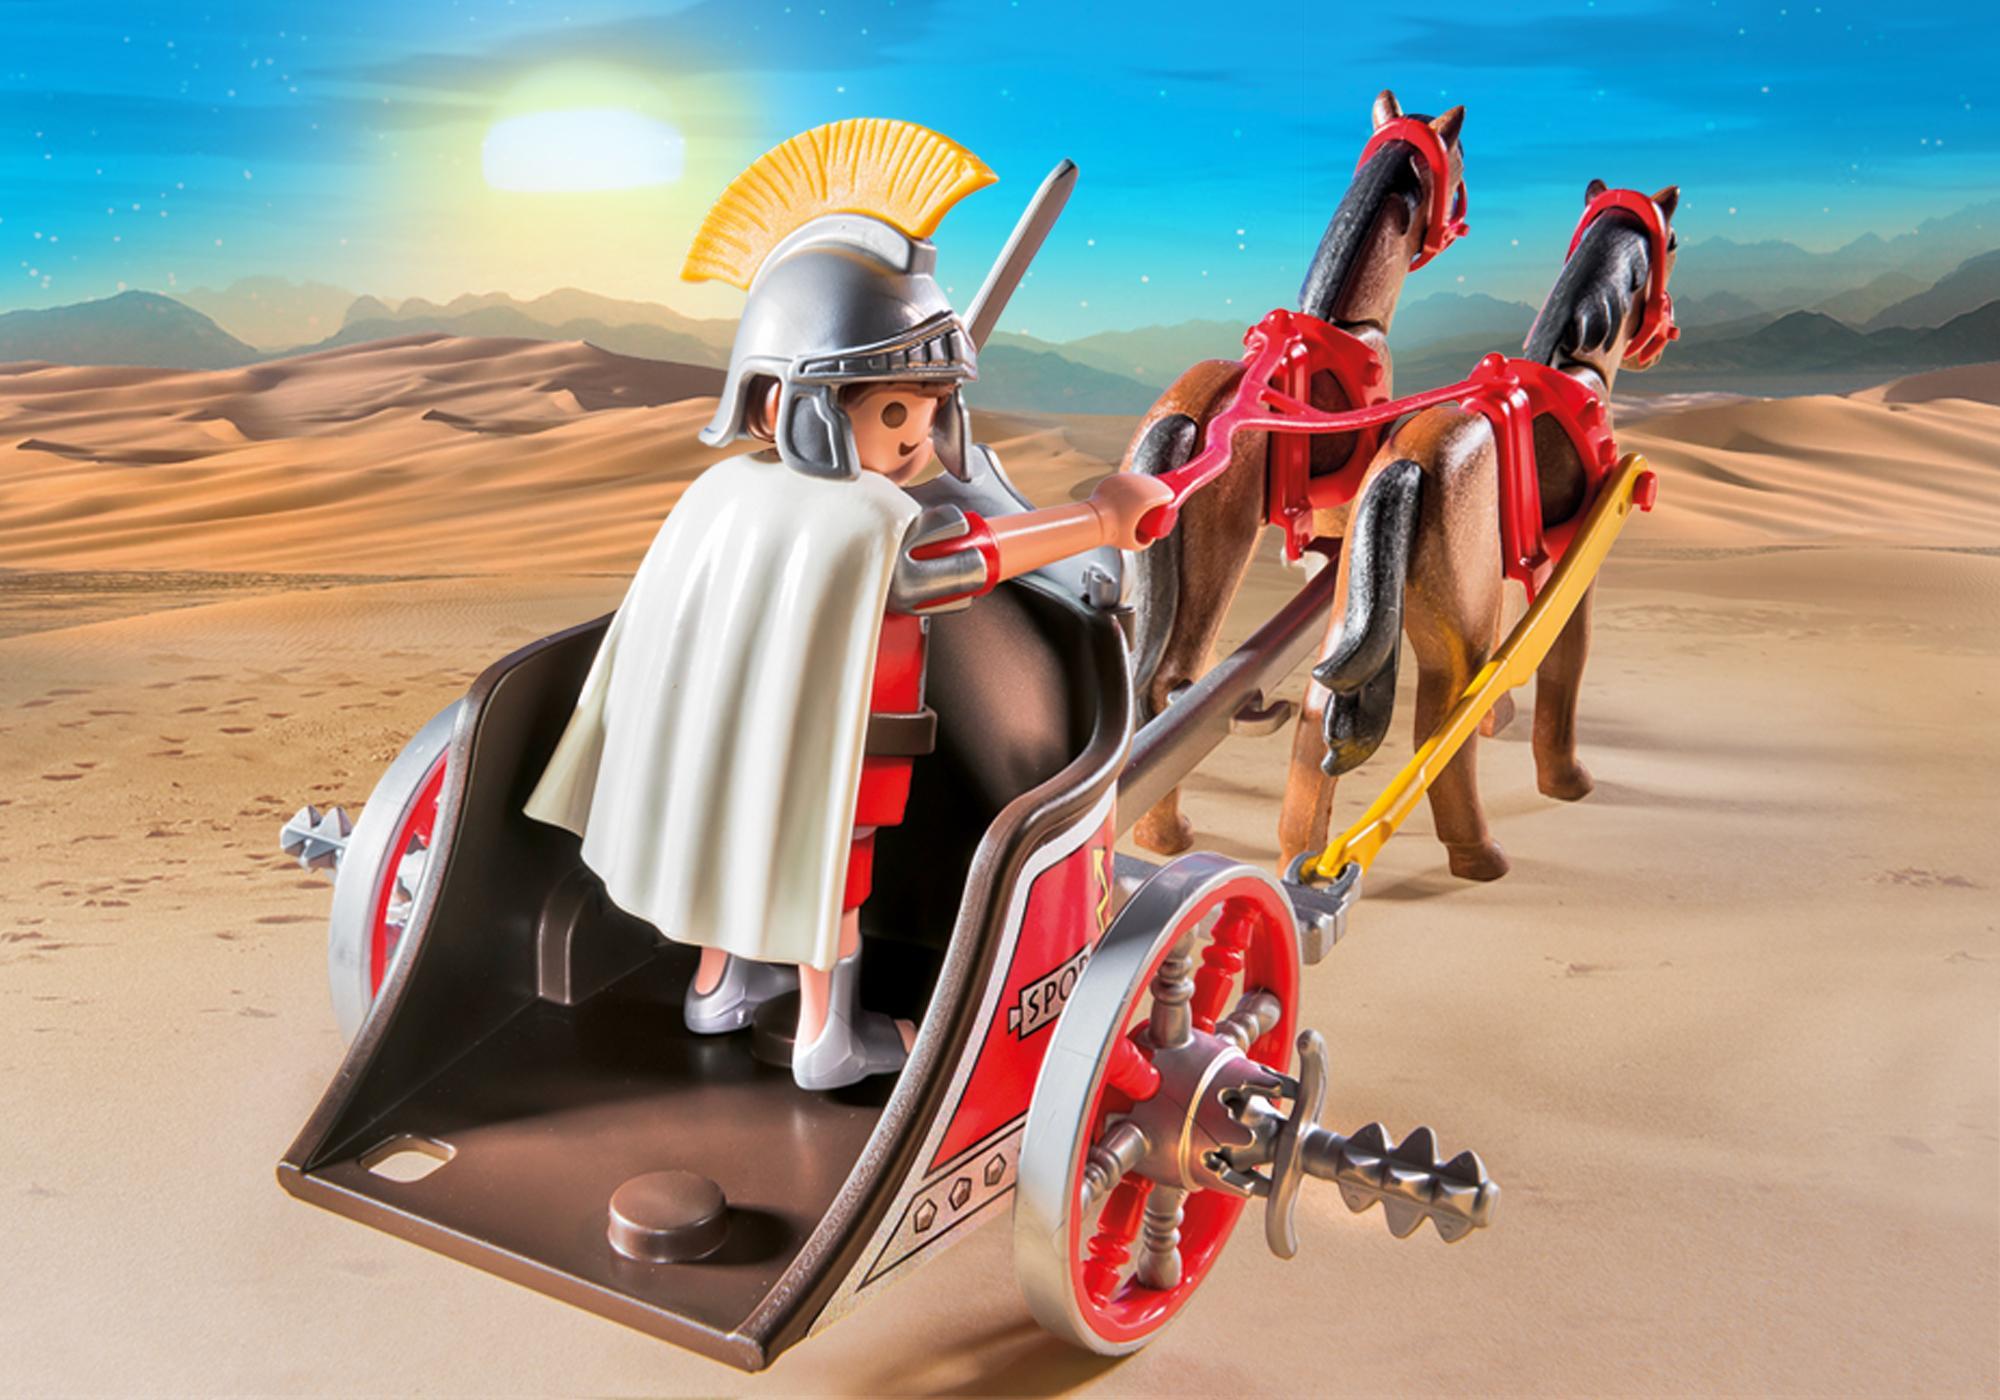 http://media.playmobil.com/i/playmobil/5391_product_extra1/Римляне и Египтяне: Римская Колесница